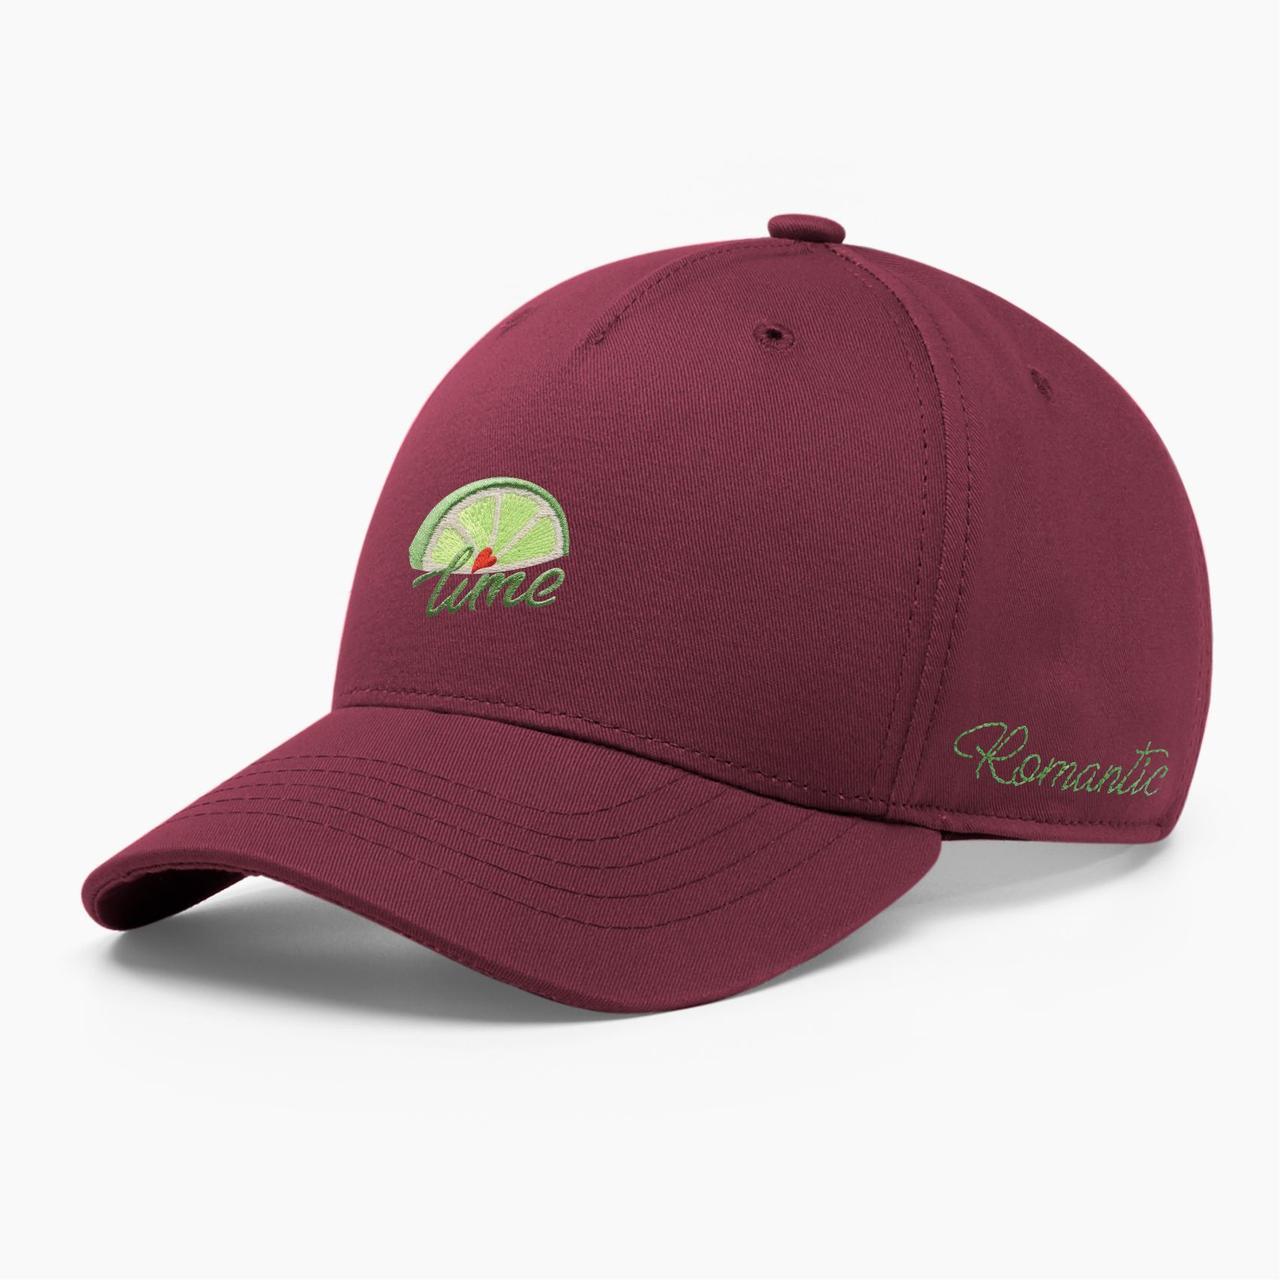 Женская кепка бейсболка INAL лайм S / 53-54 RU Бордовый 285553